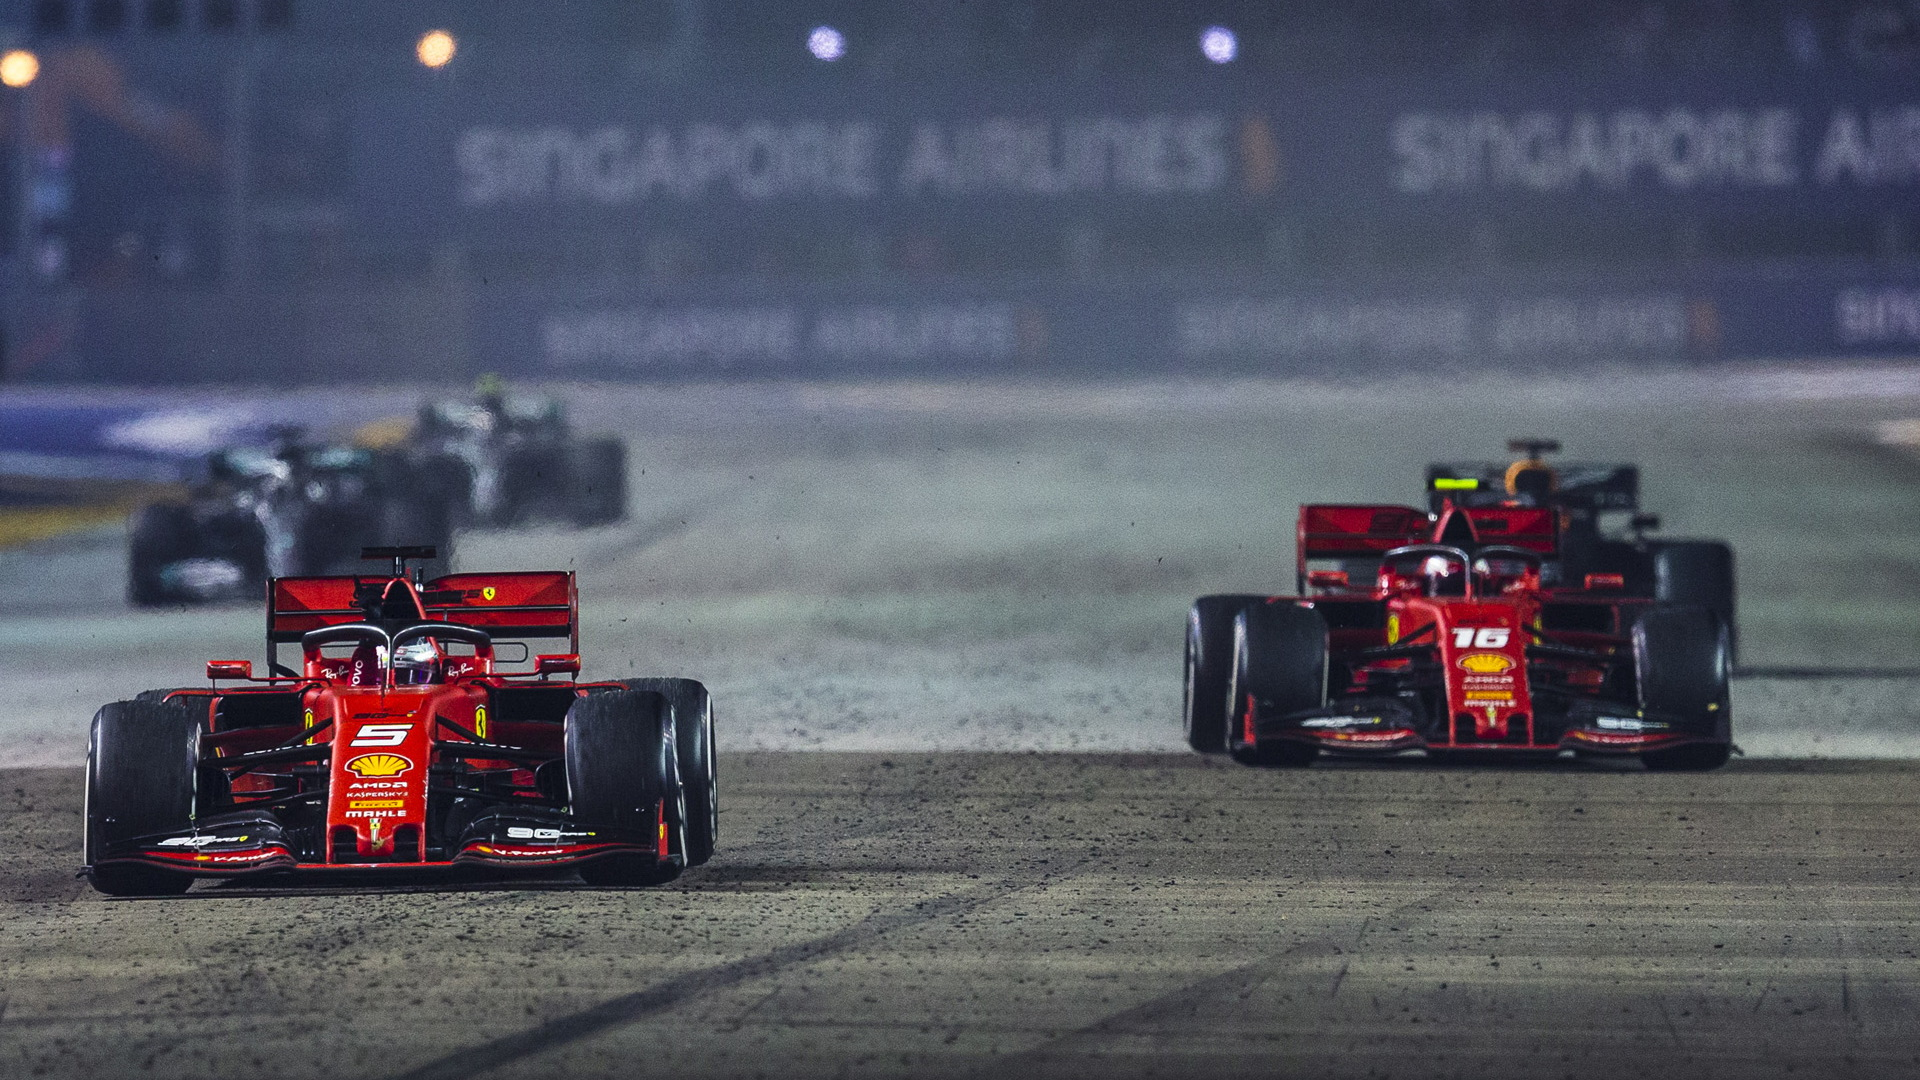 Ferrari at the 2019 Formula One Singapore Grand Prix